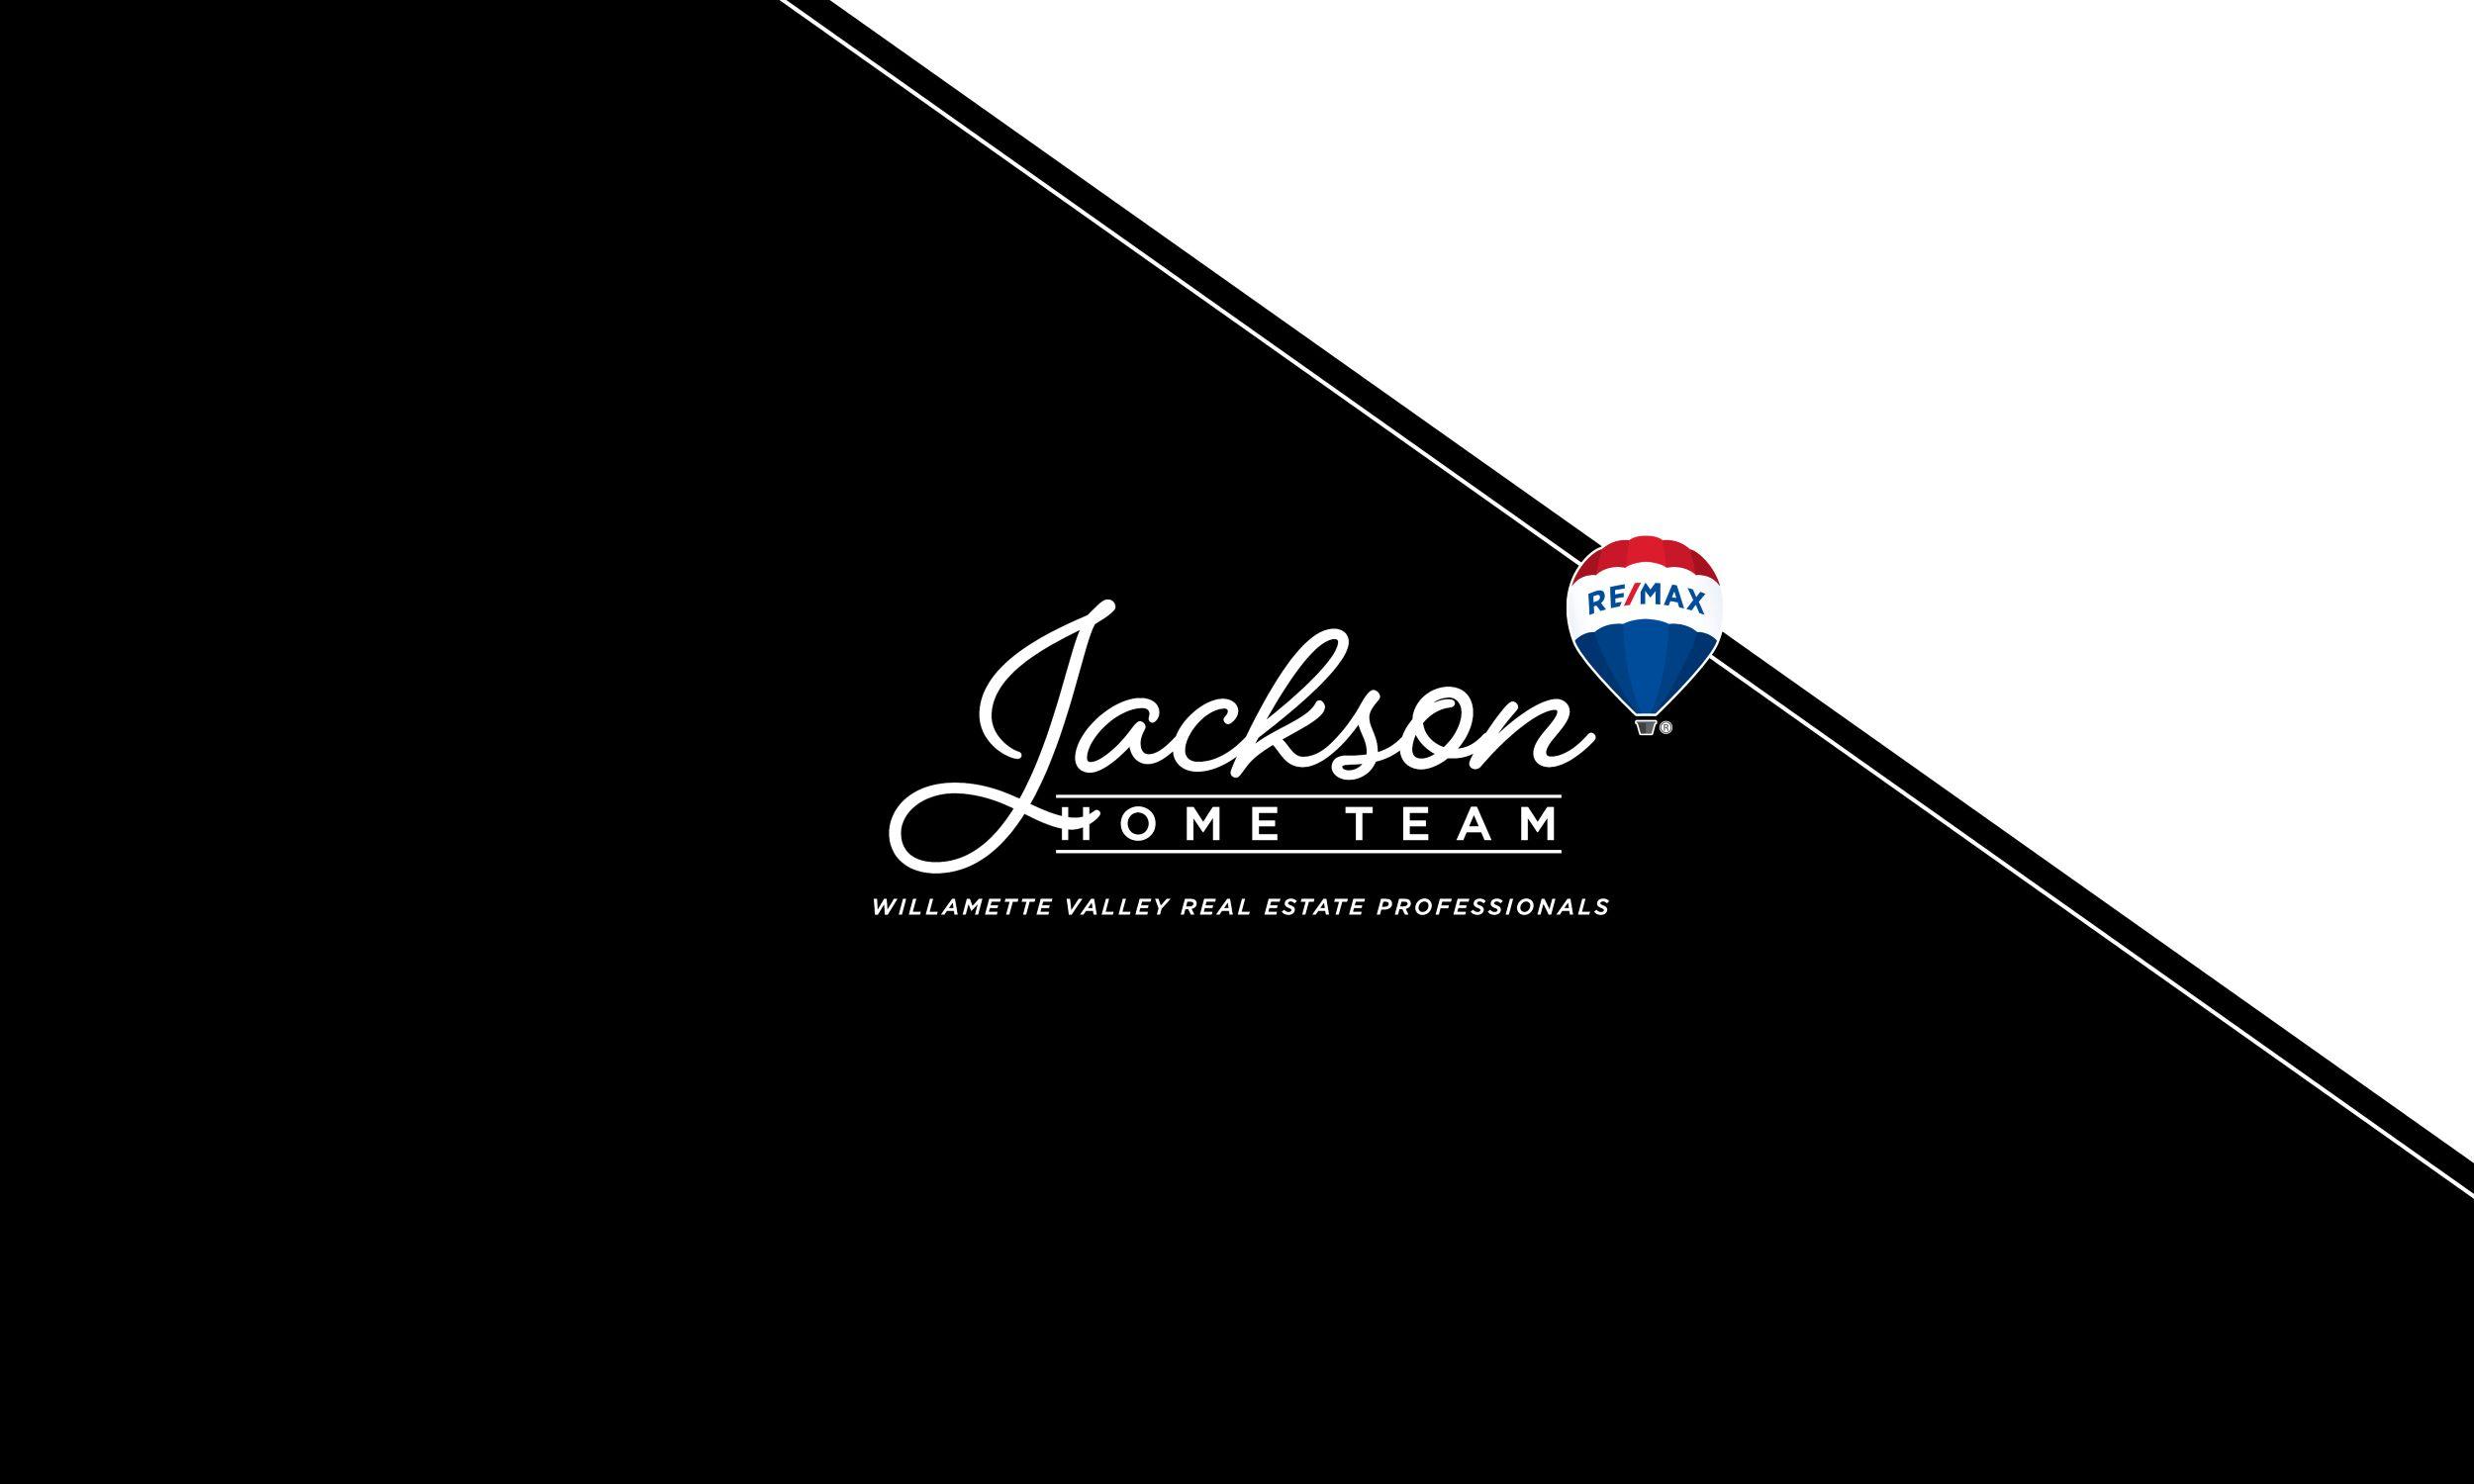 Jackson Home Team